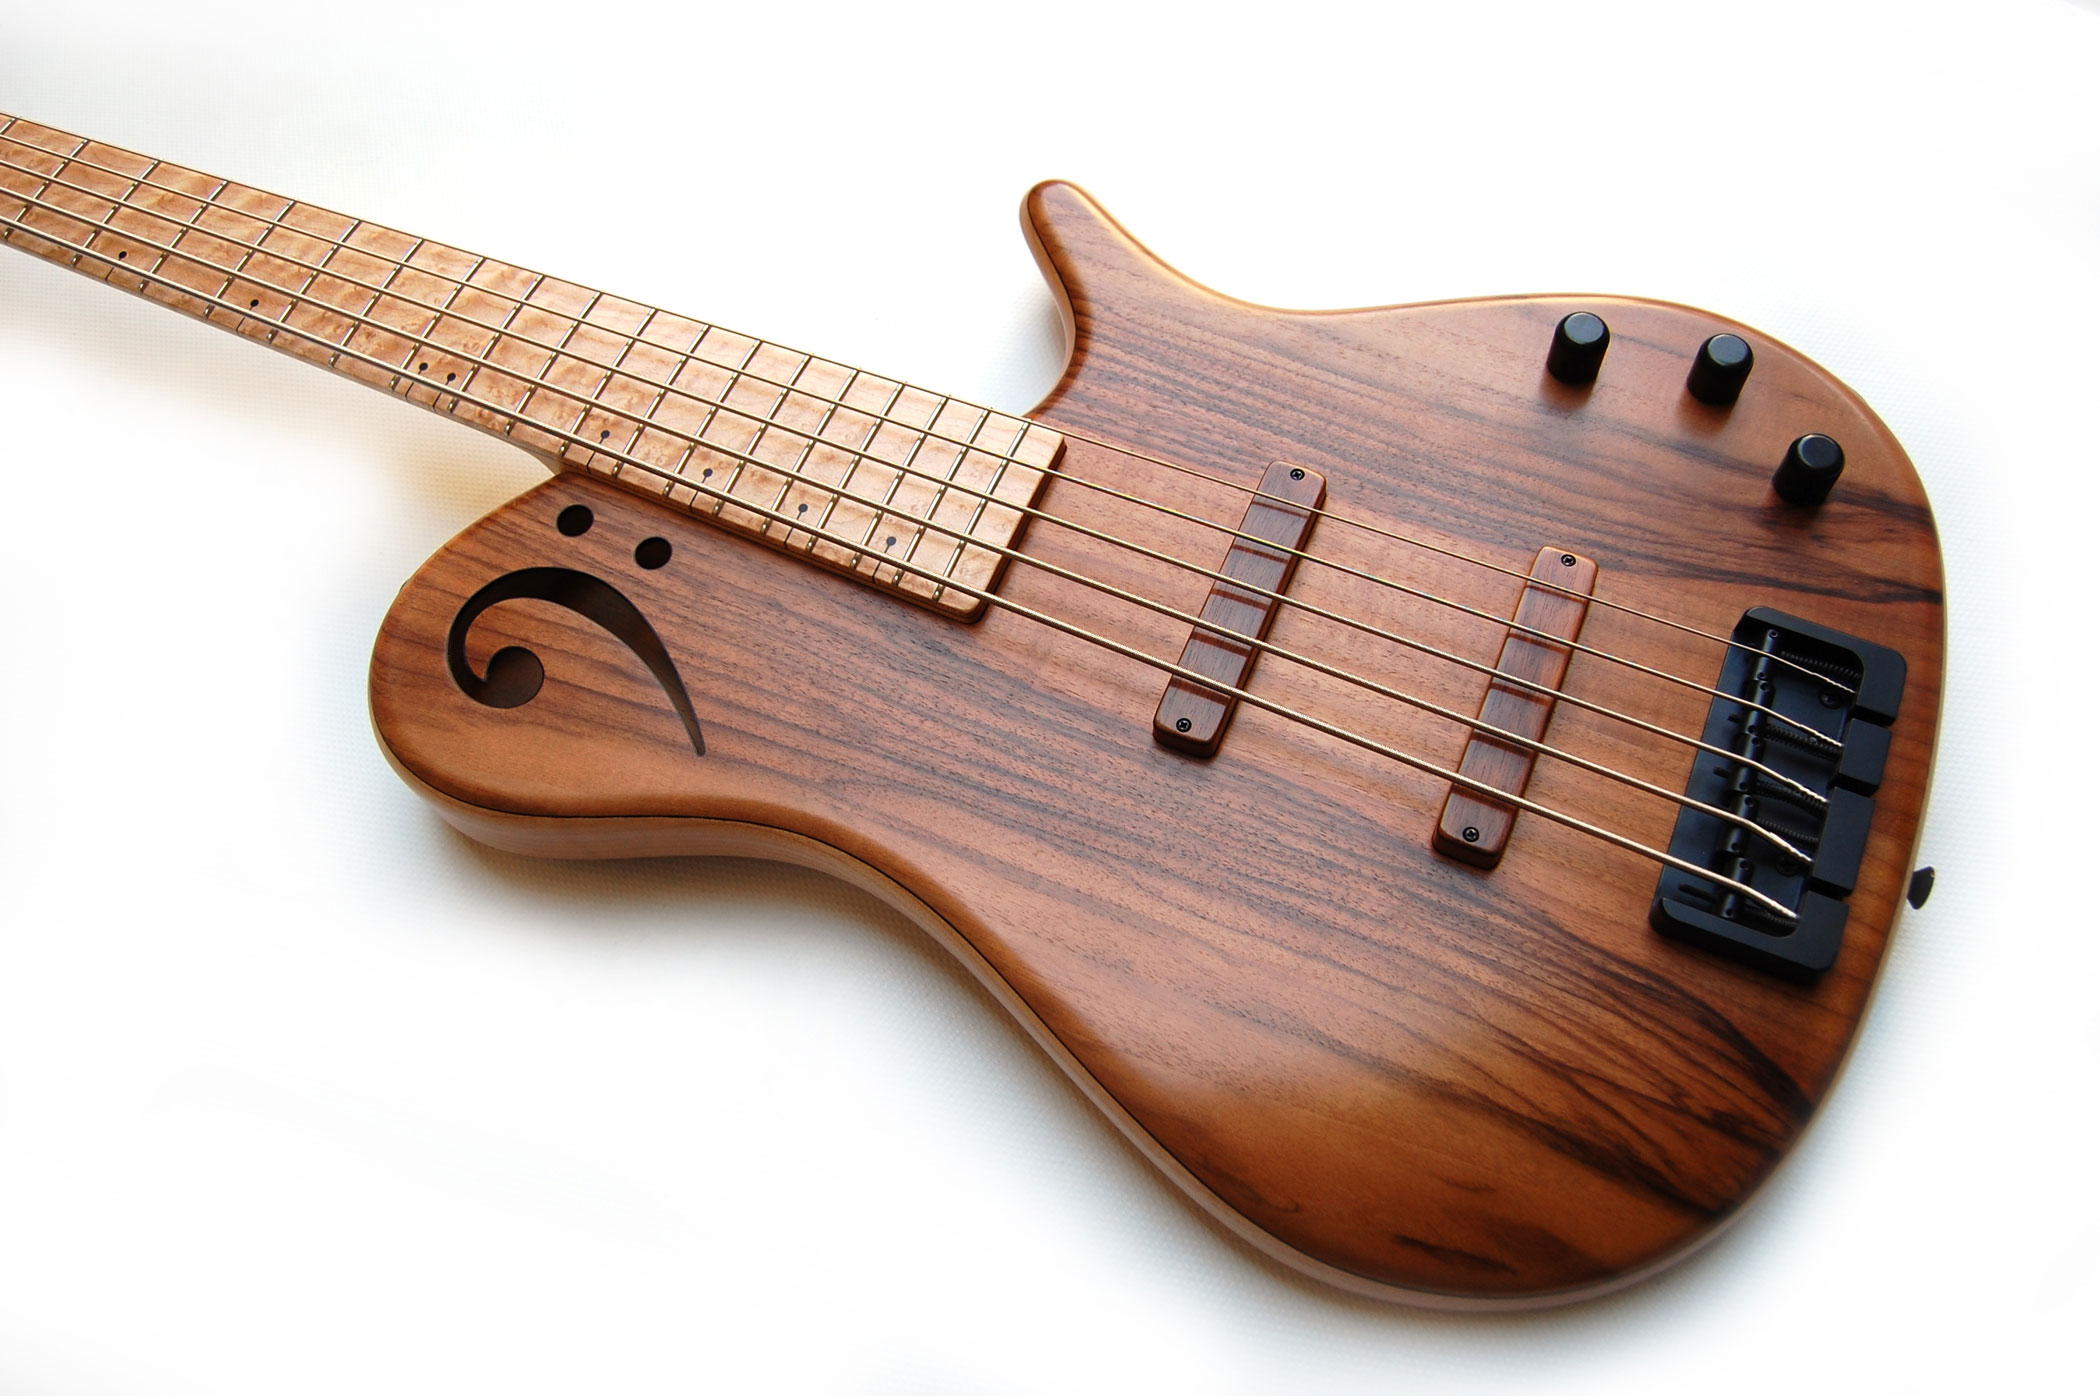 Proxima de sensi 5 strings walnut body